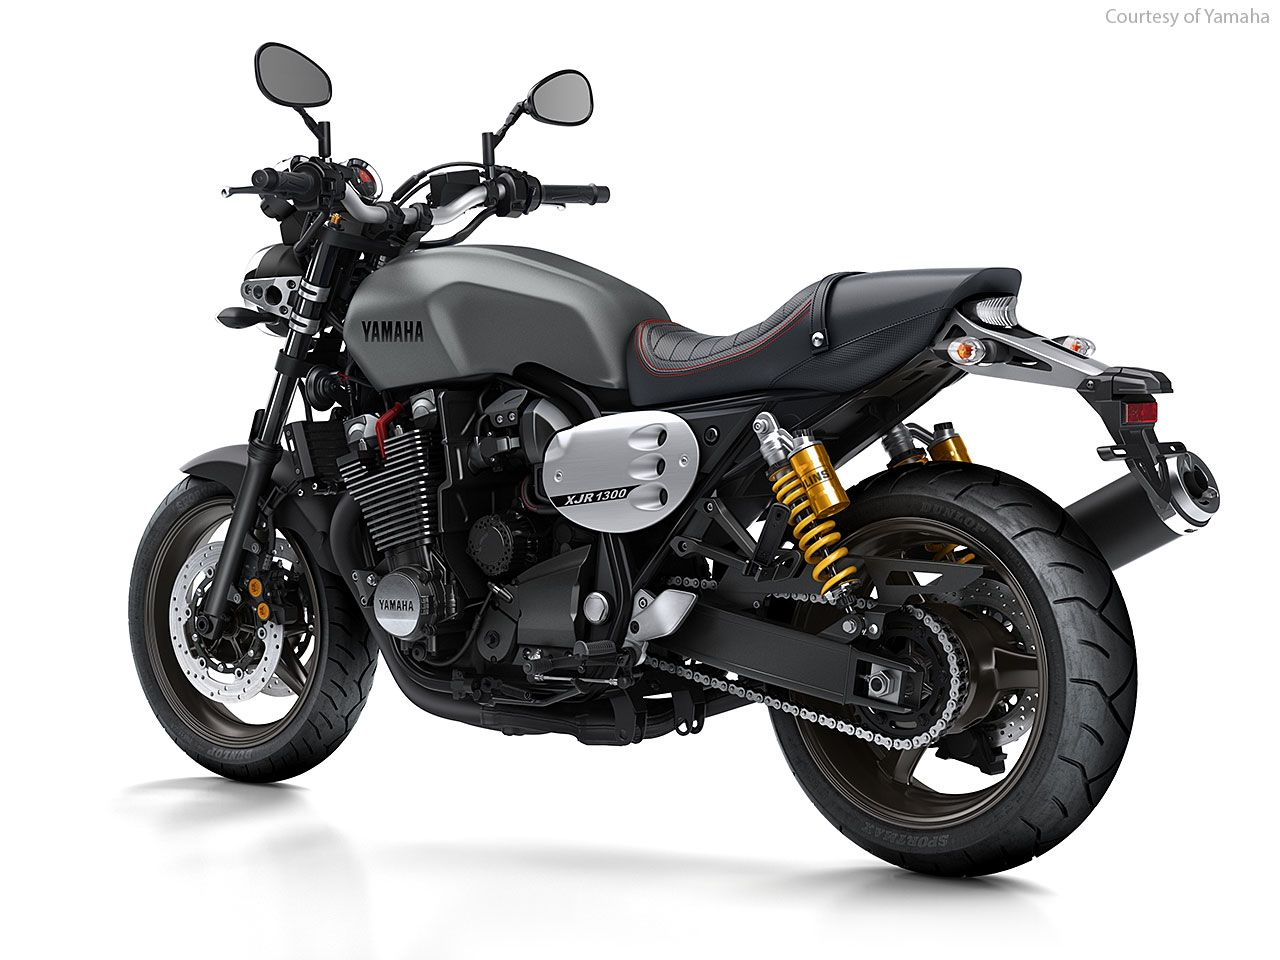 2015 Yamaha XJR1300 First Look Photos - Motorcycle USA ...